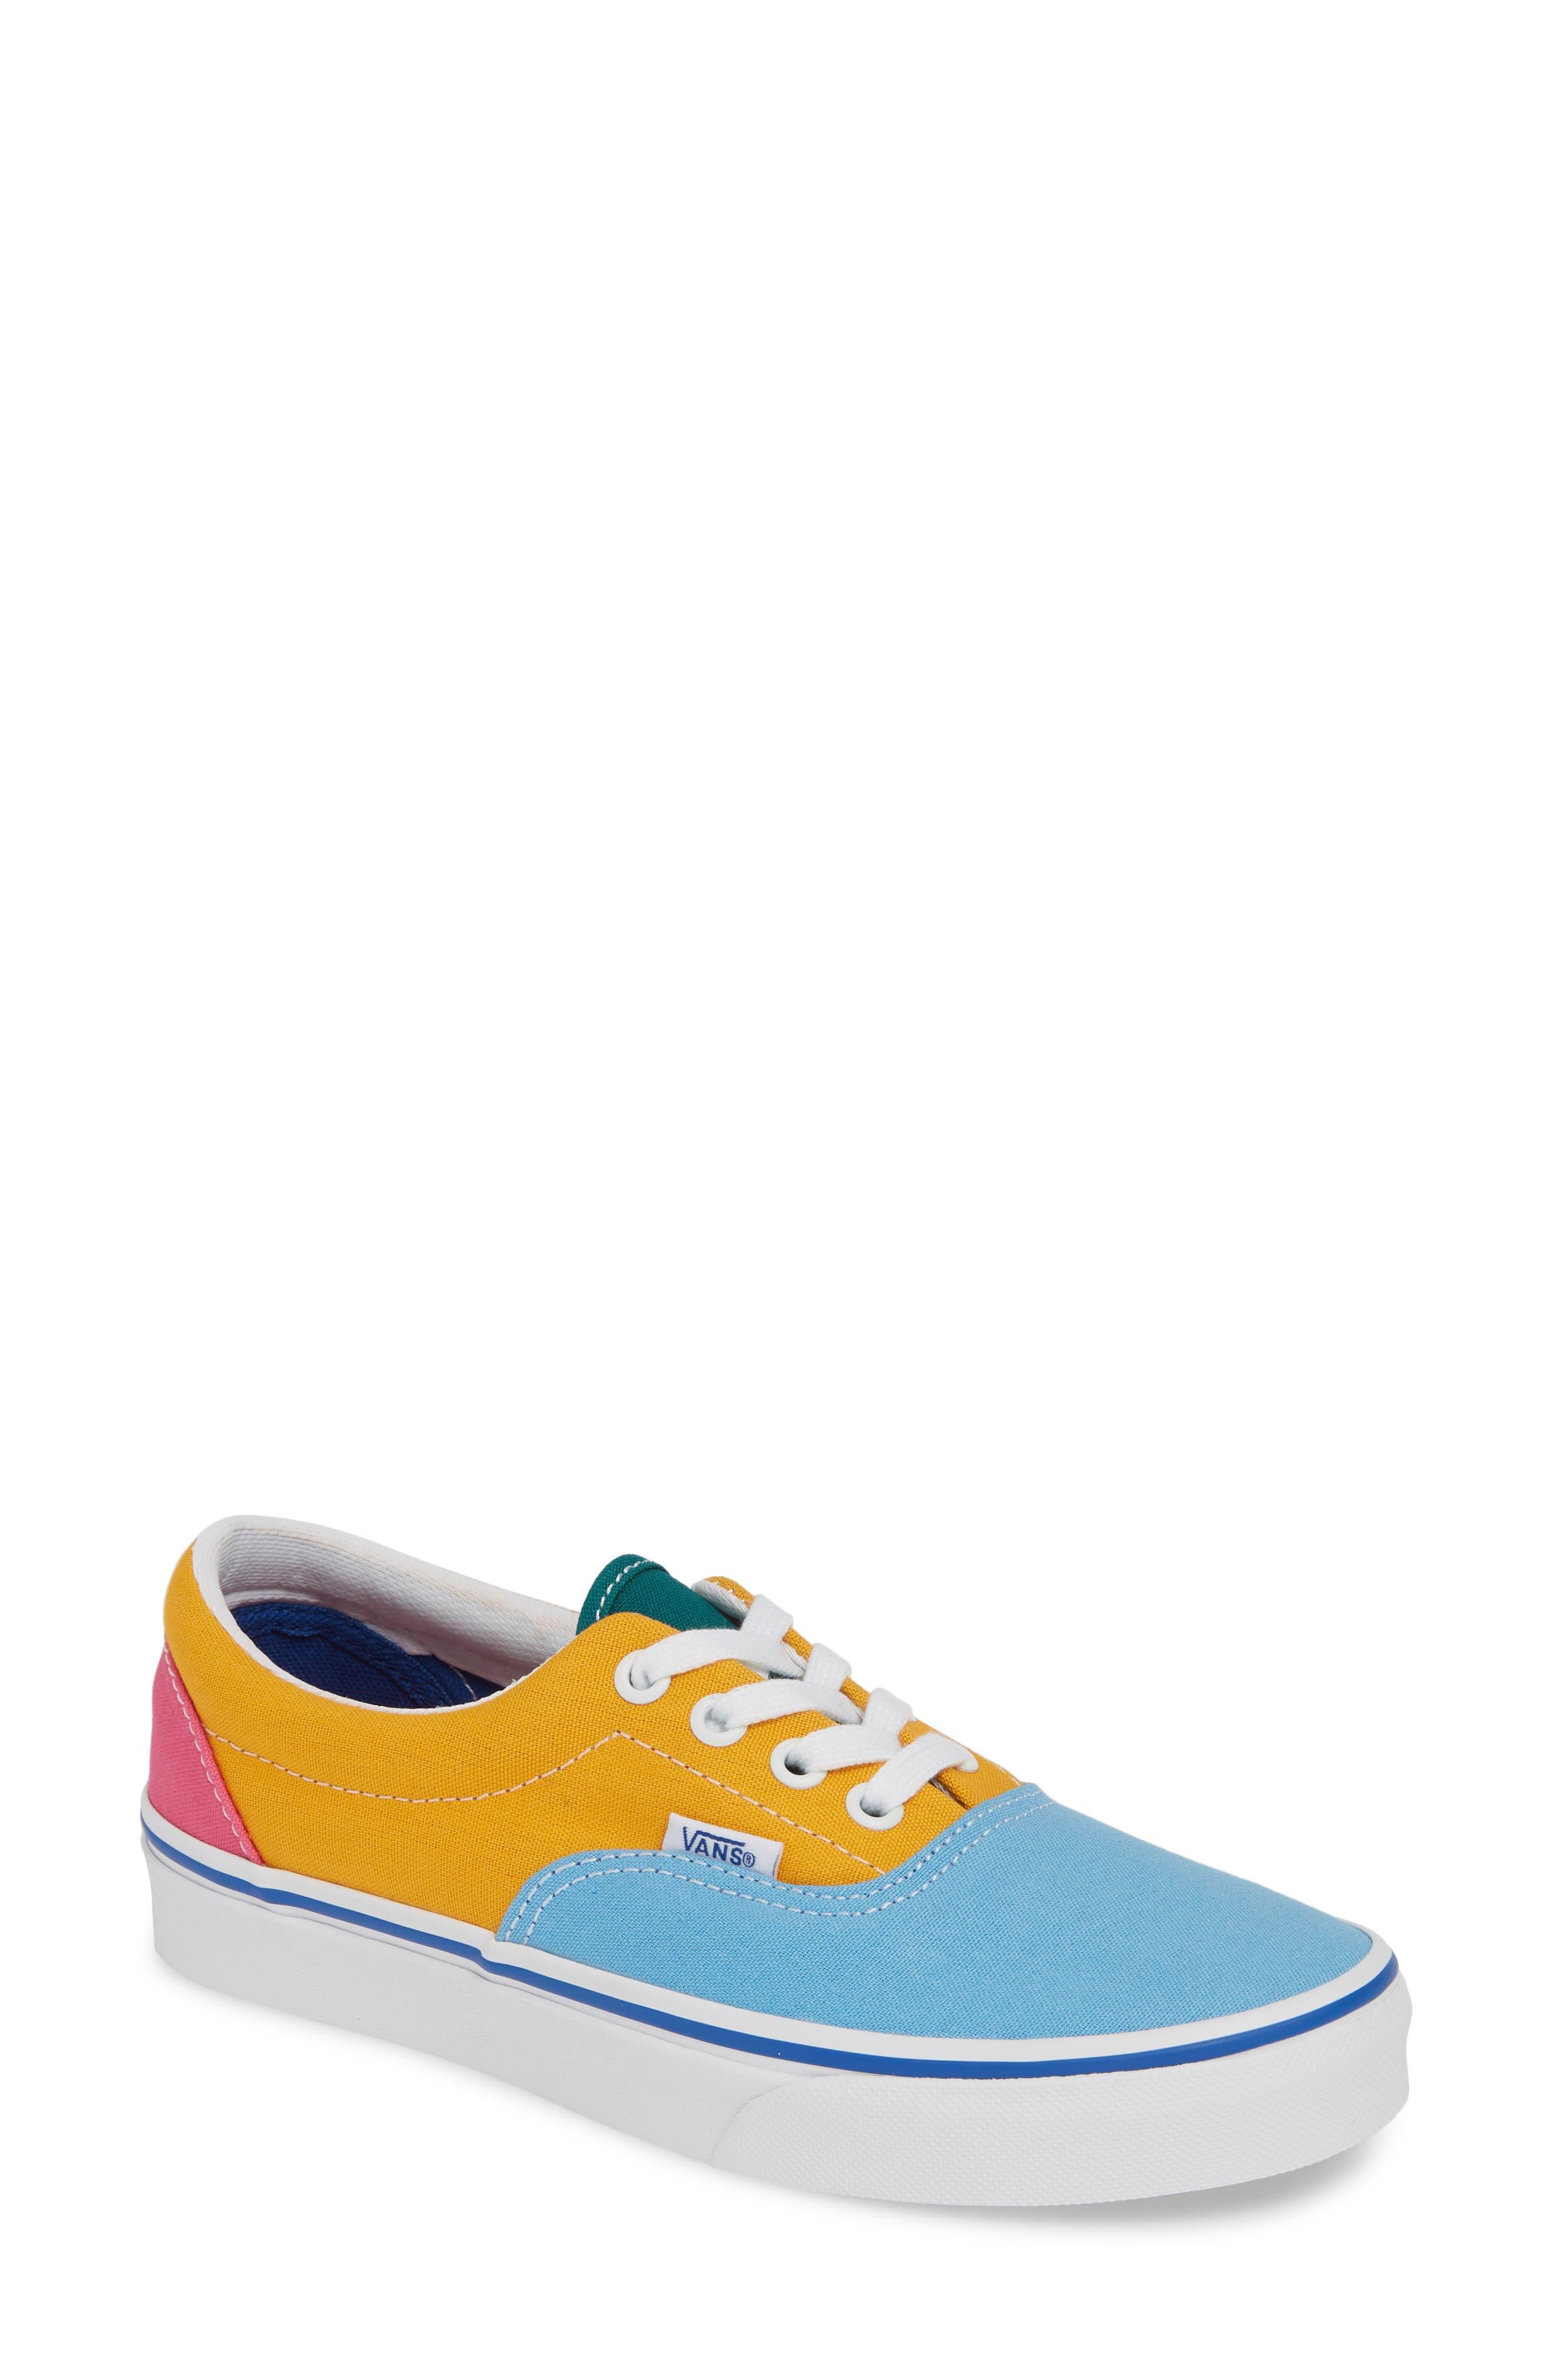 Vans Era Multi Sneaker- Orange